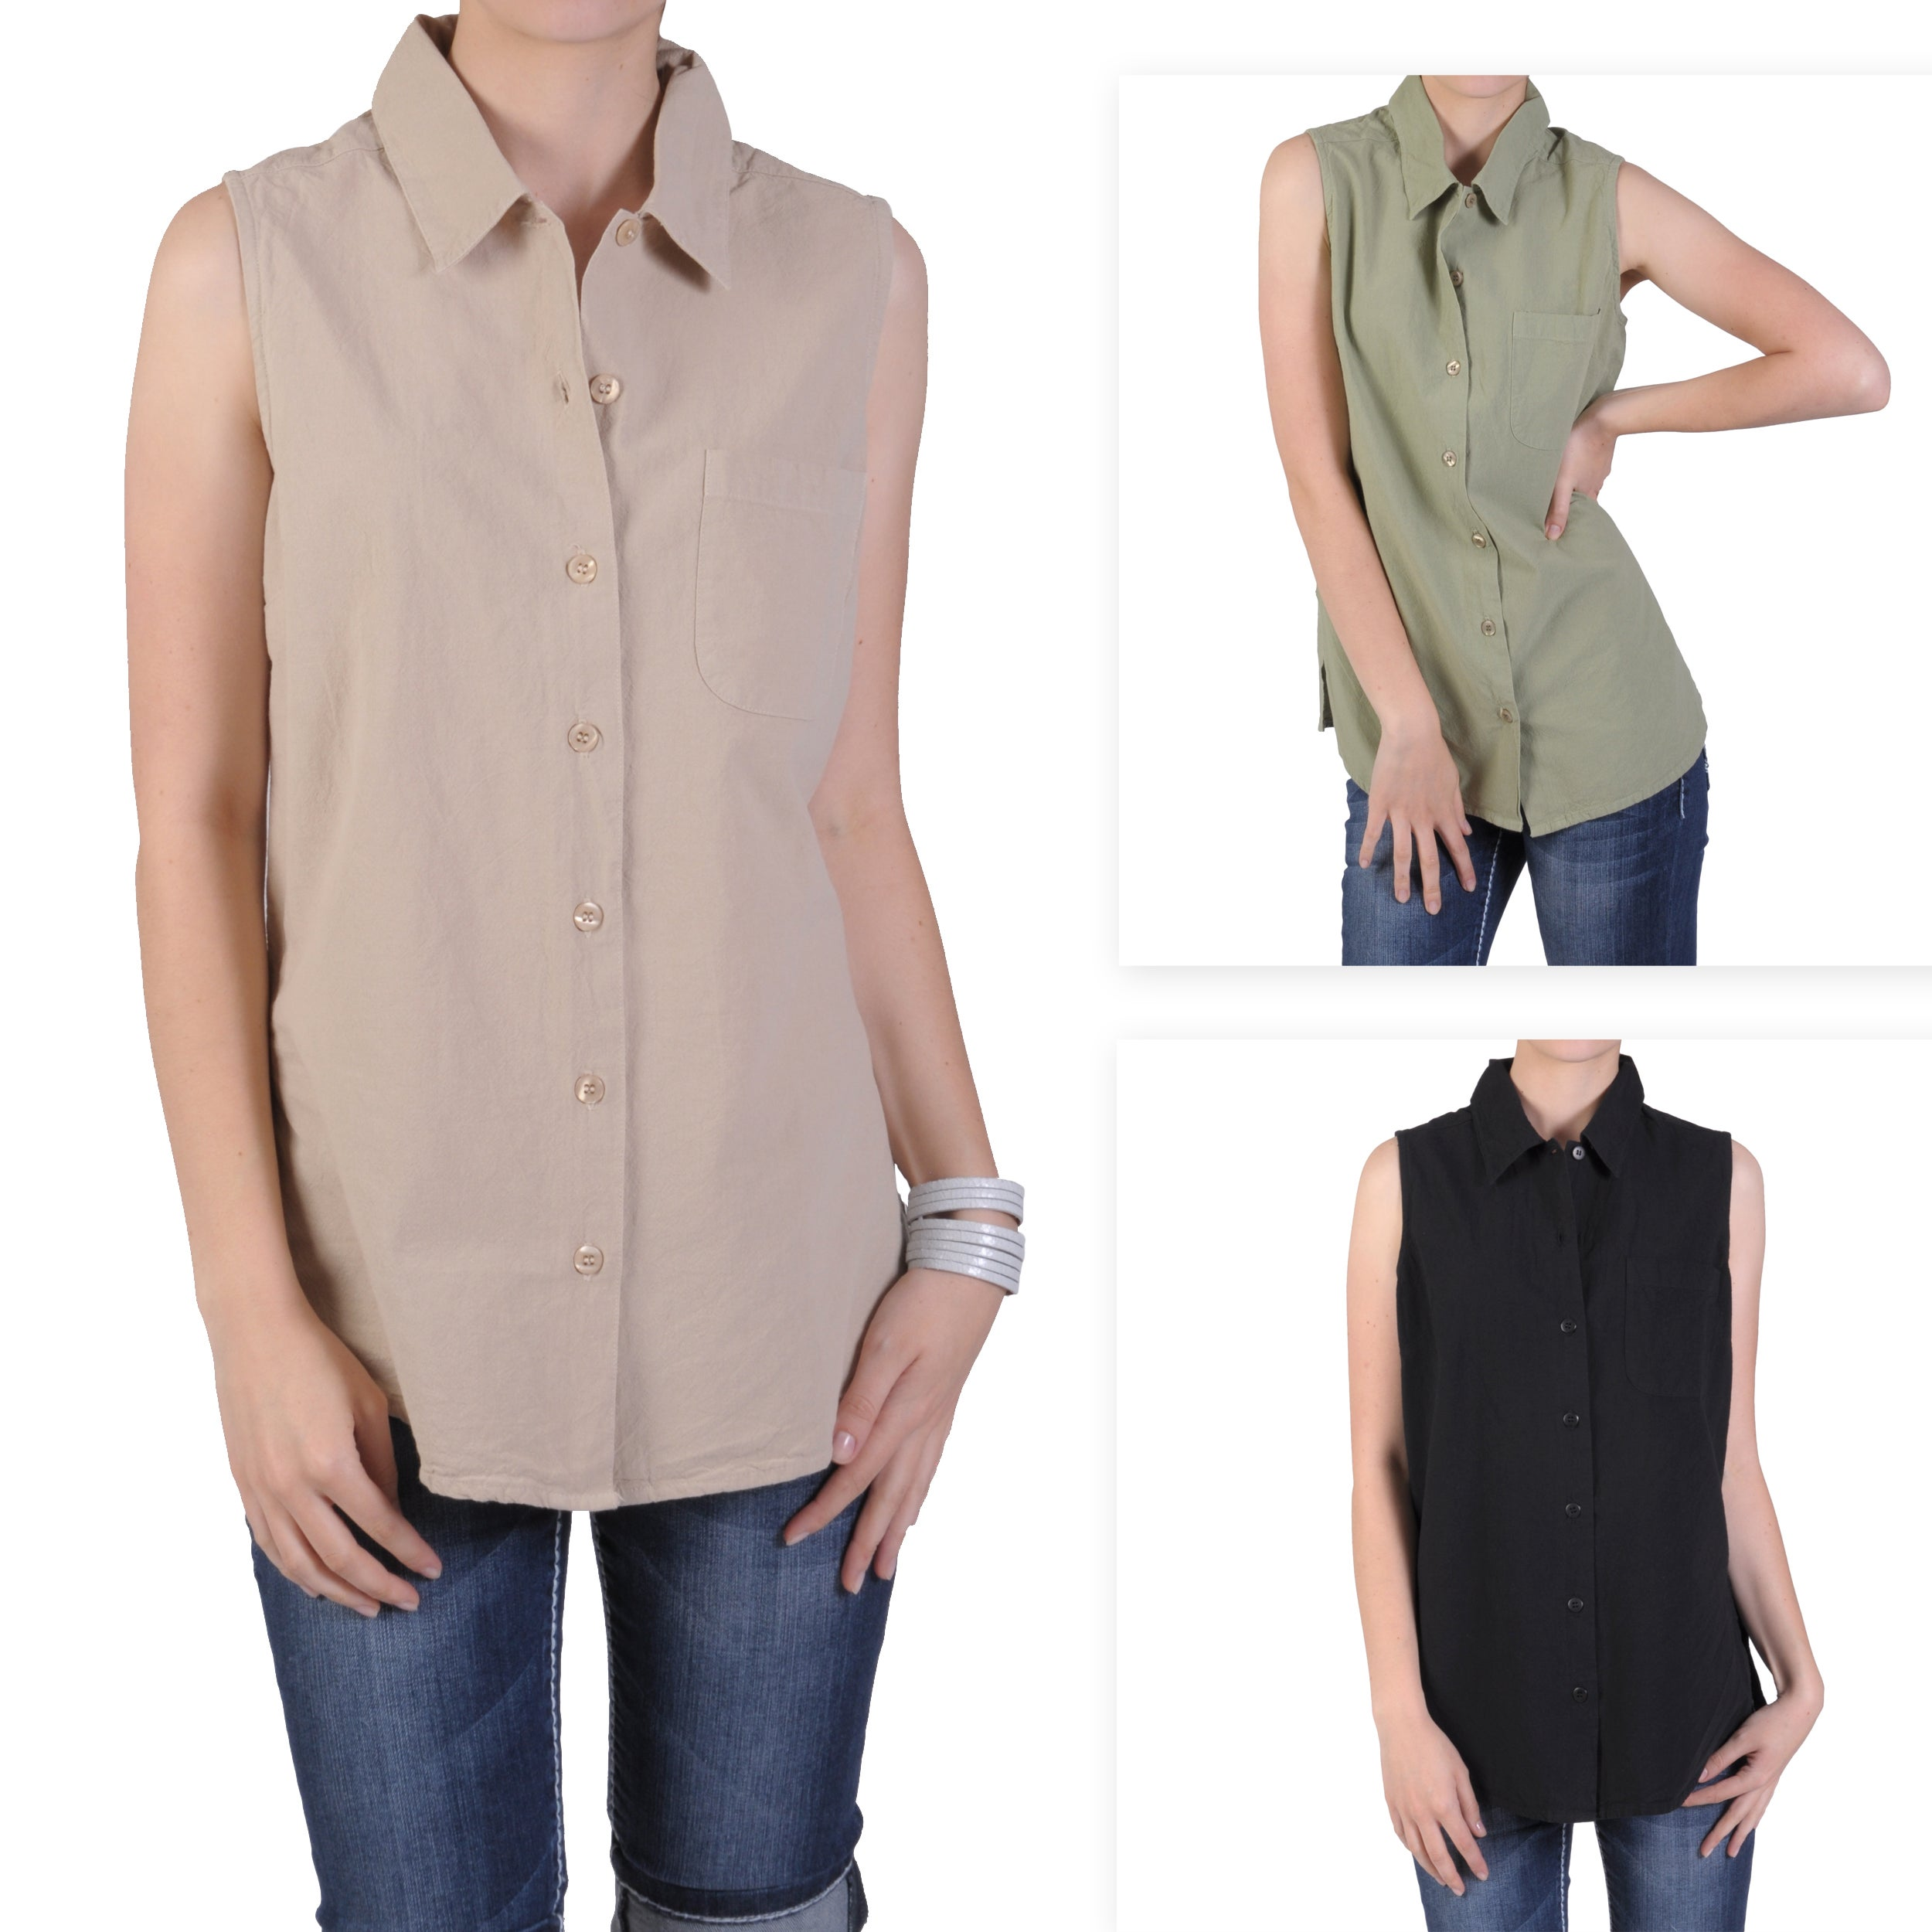 Tressa Designs Women's Button-up Front Pocket Top